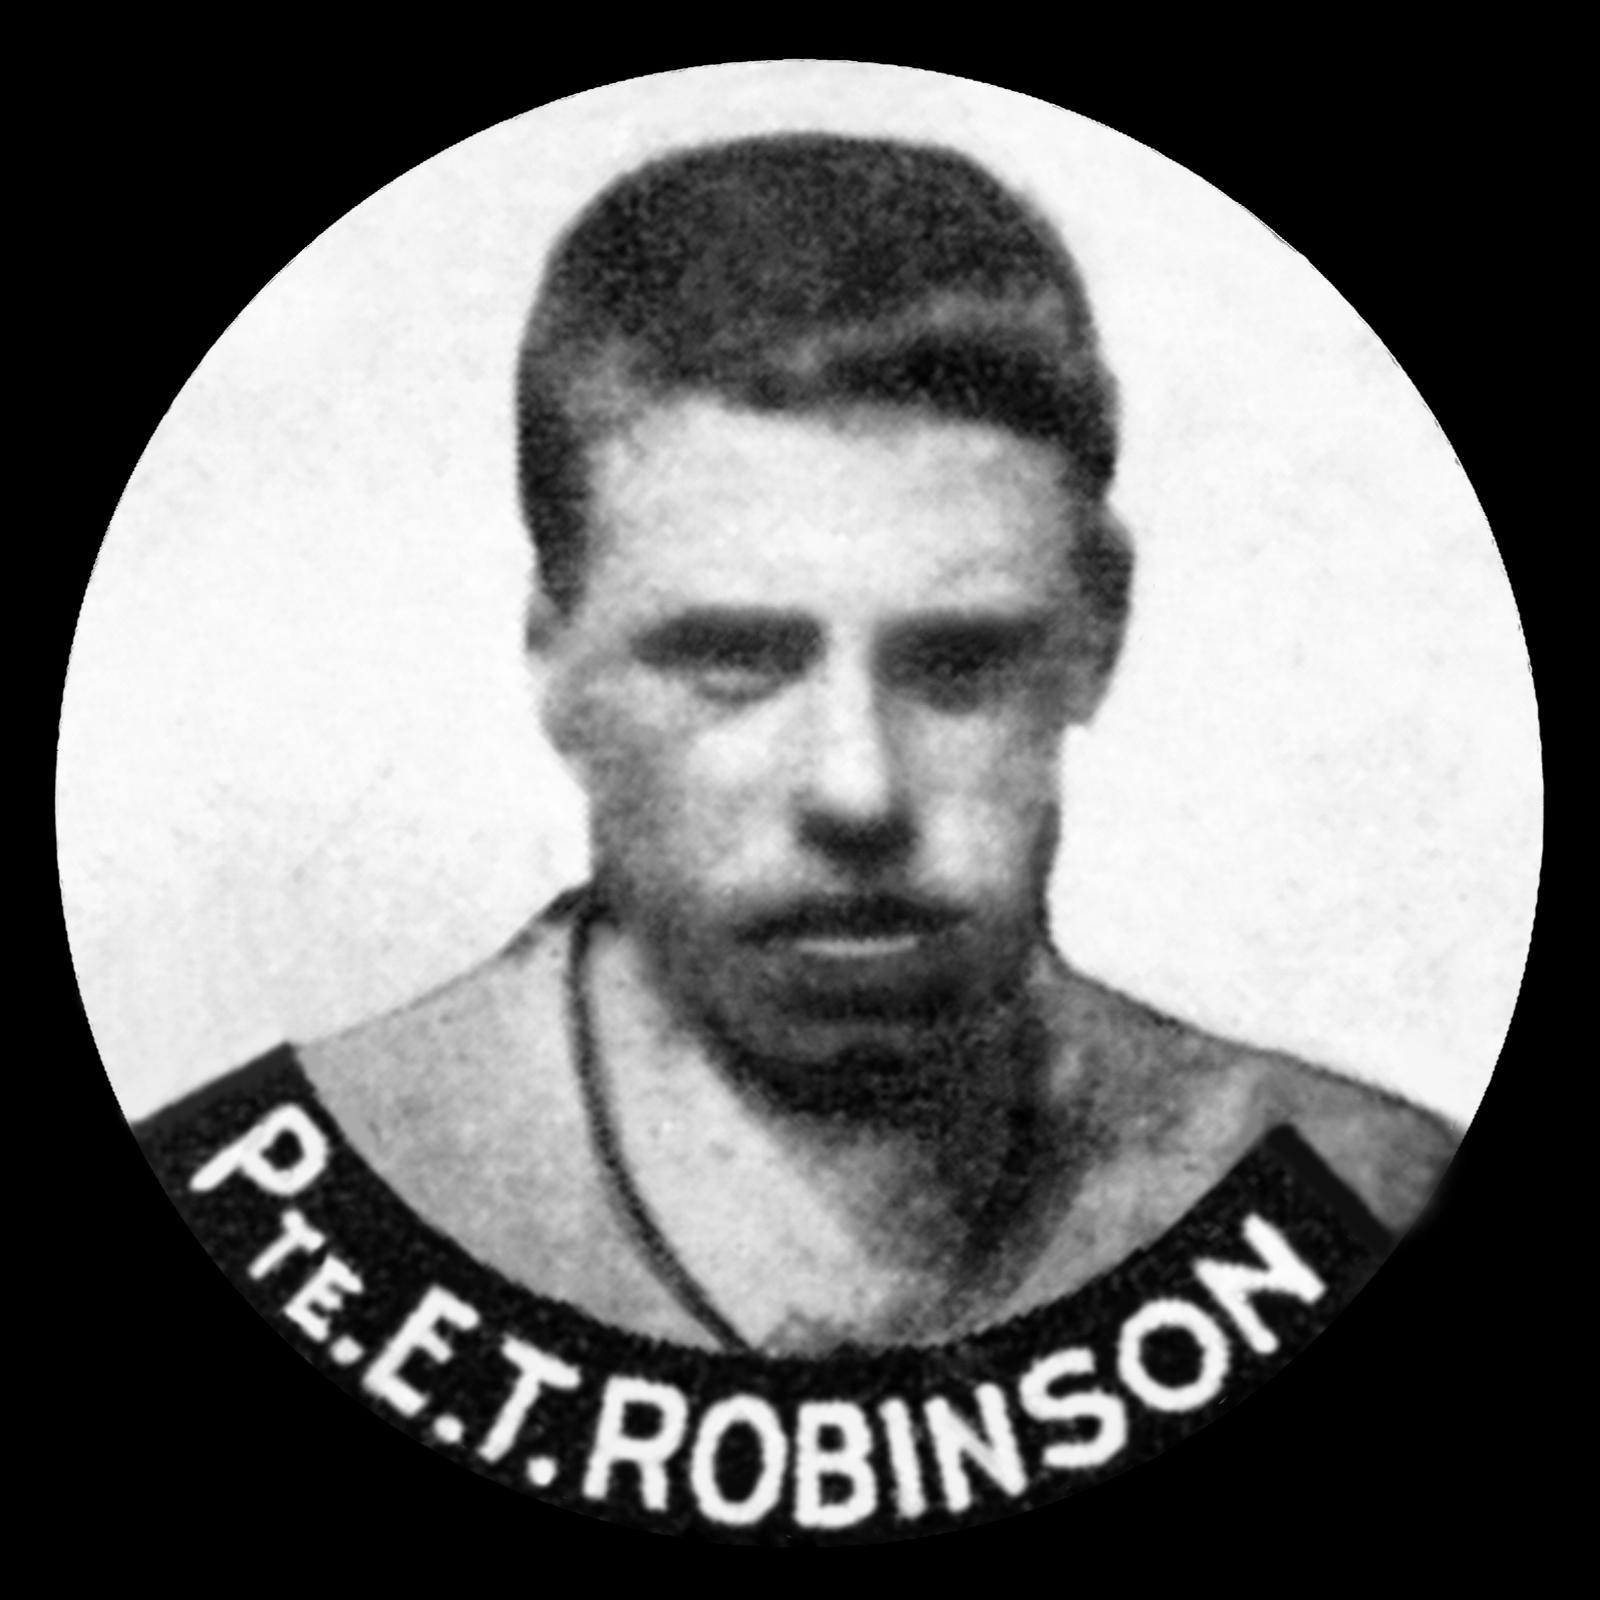 ROBINSON Ernest Thomas